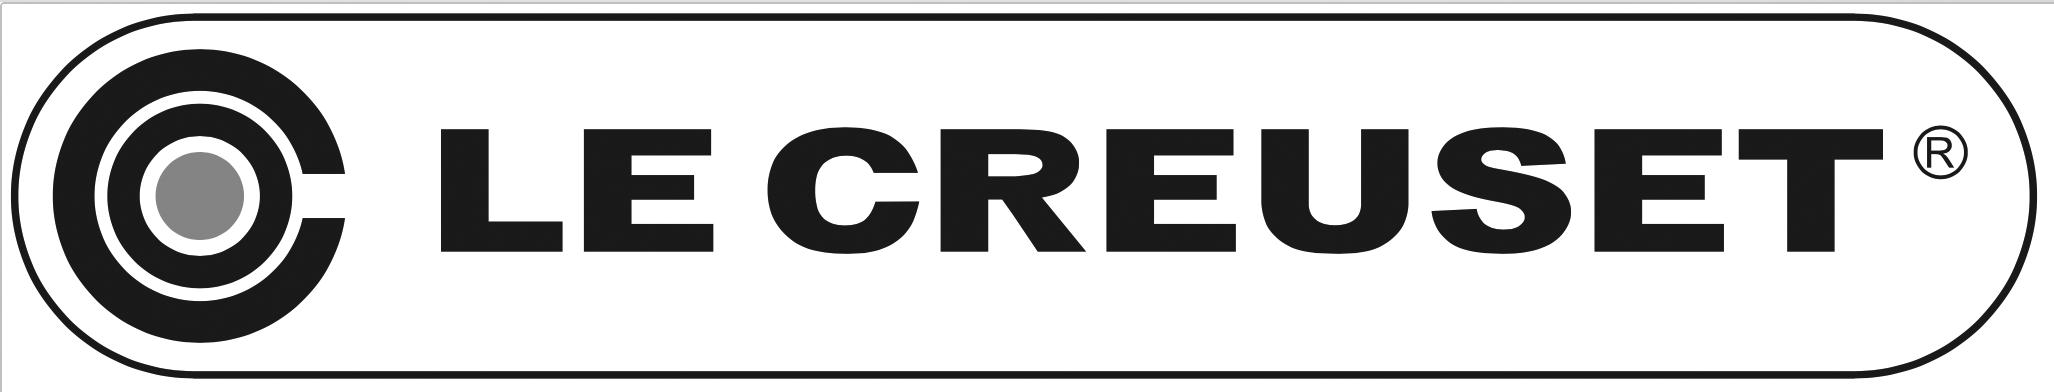 LeCreuset.png